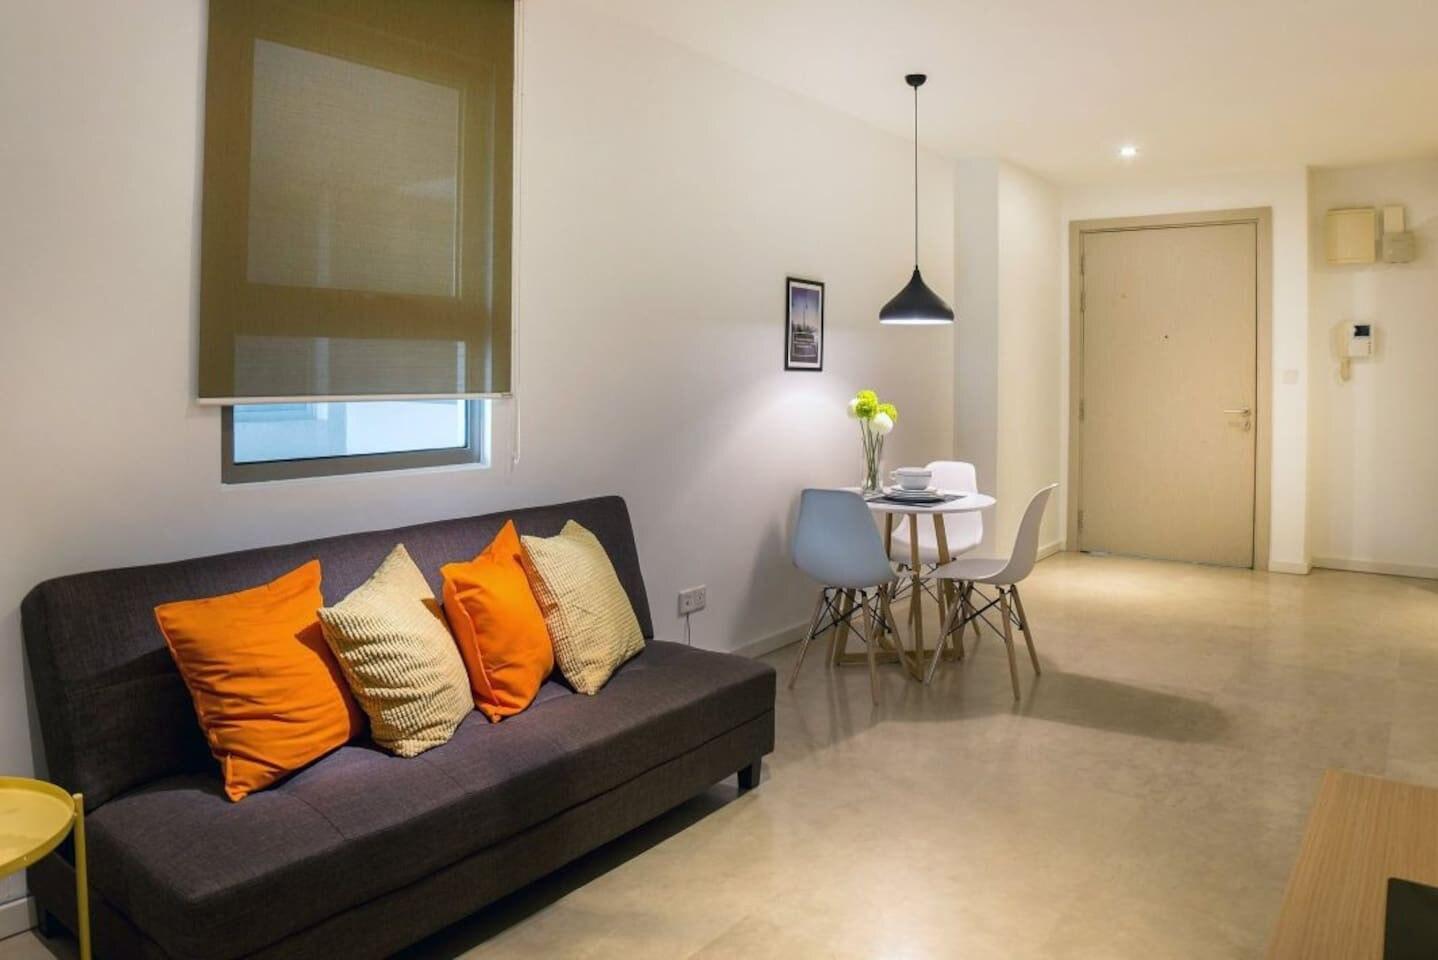 New Bintang Fairlane Residence @AJ Home